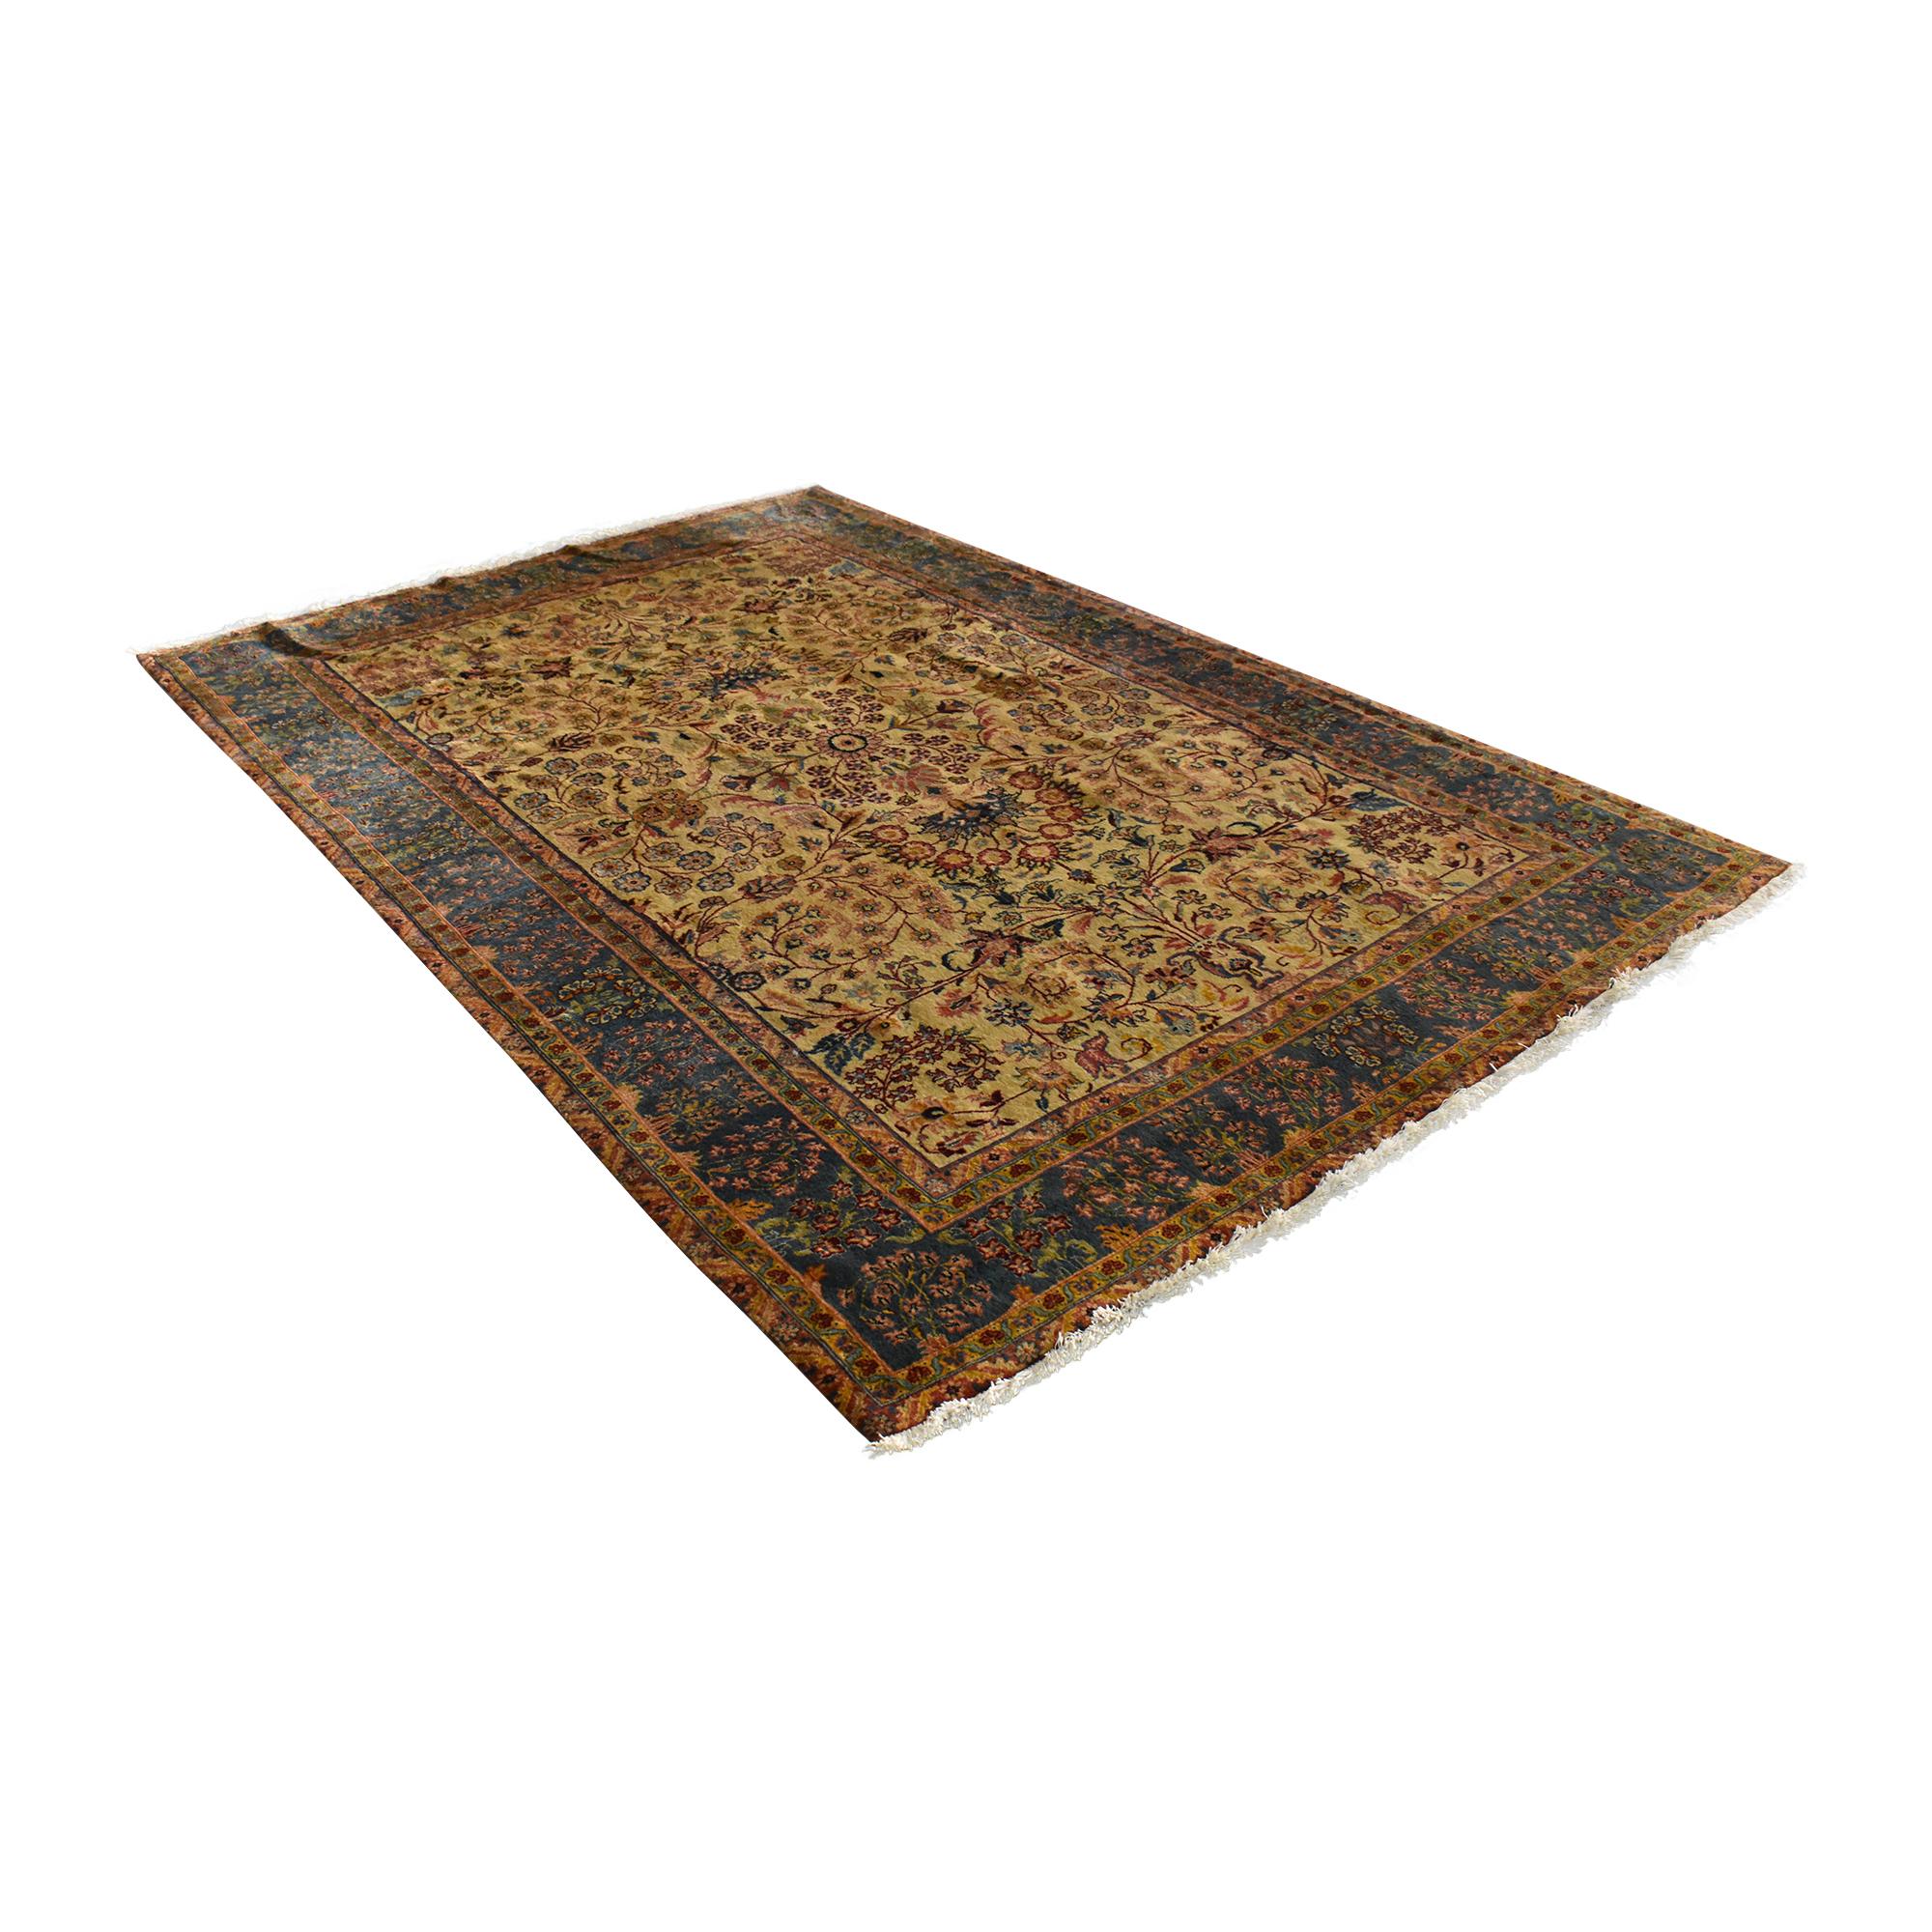 ABC Carpet & Home ABC Carpet & Home Ajmer Patterned Rug